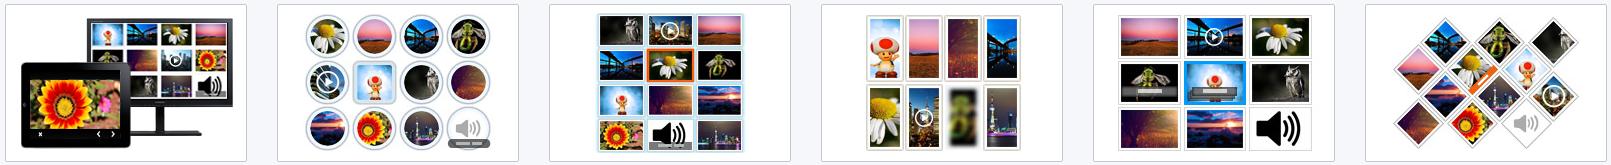 Responsive ImageList templates